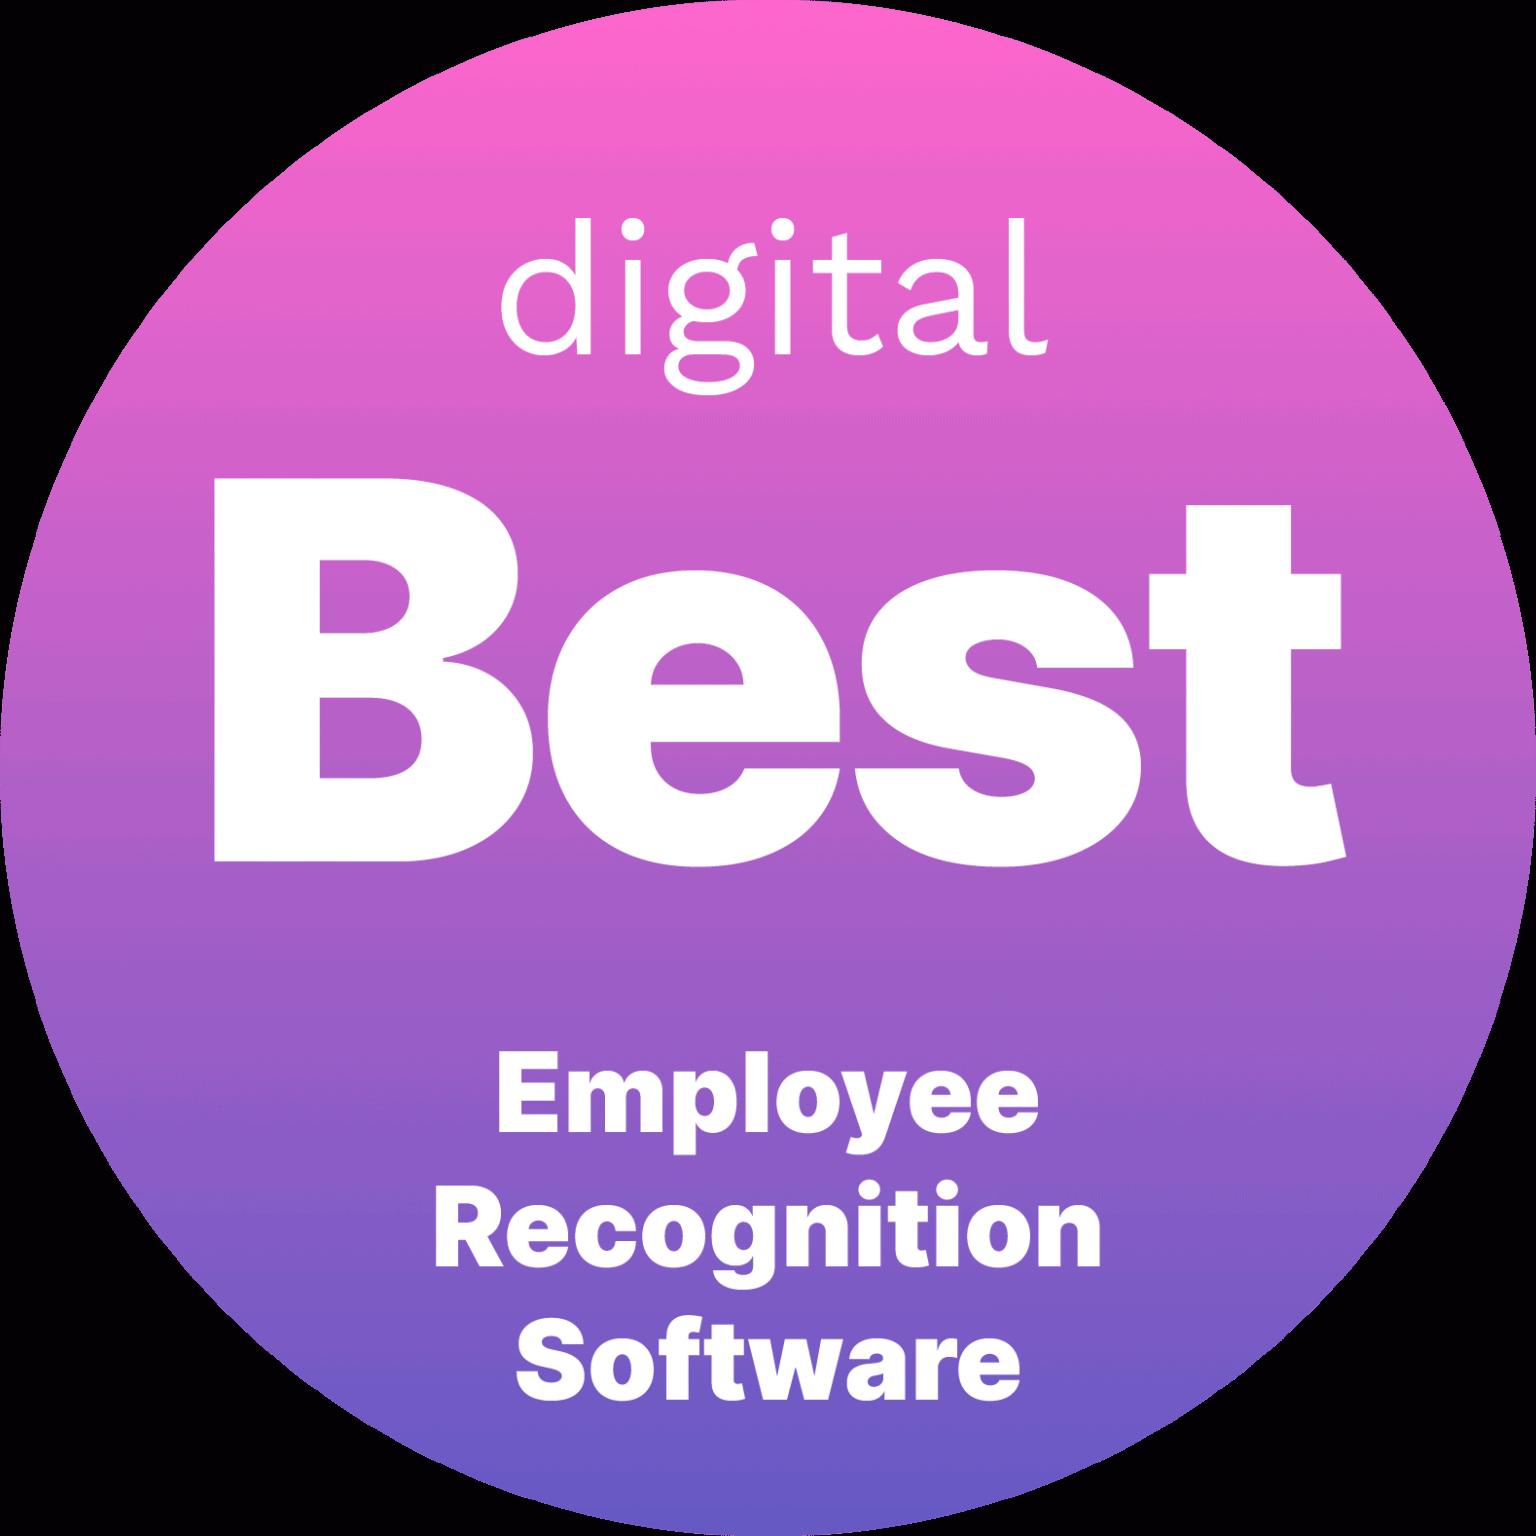 Digital badge for best employee recognition software